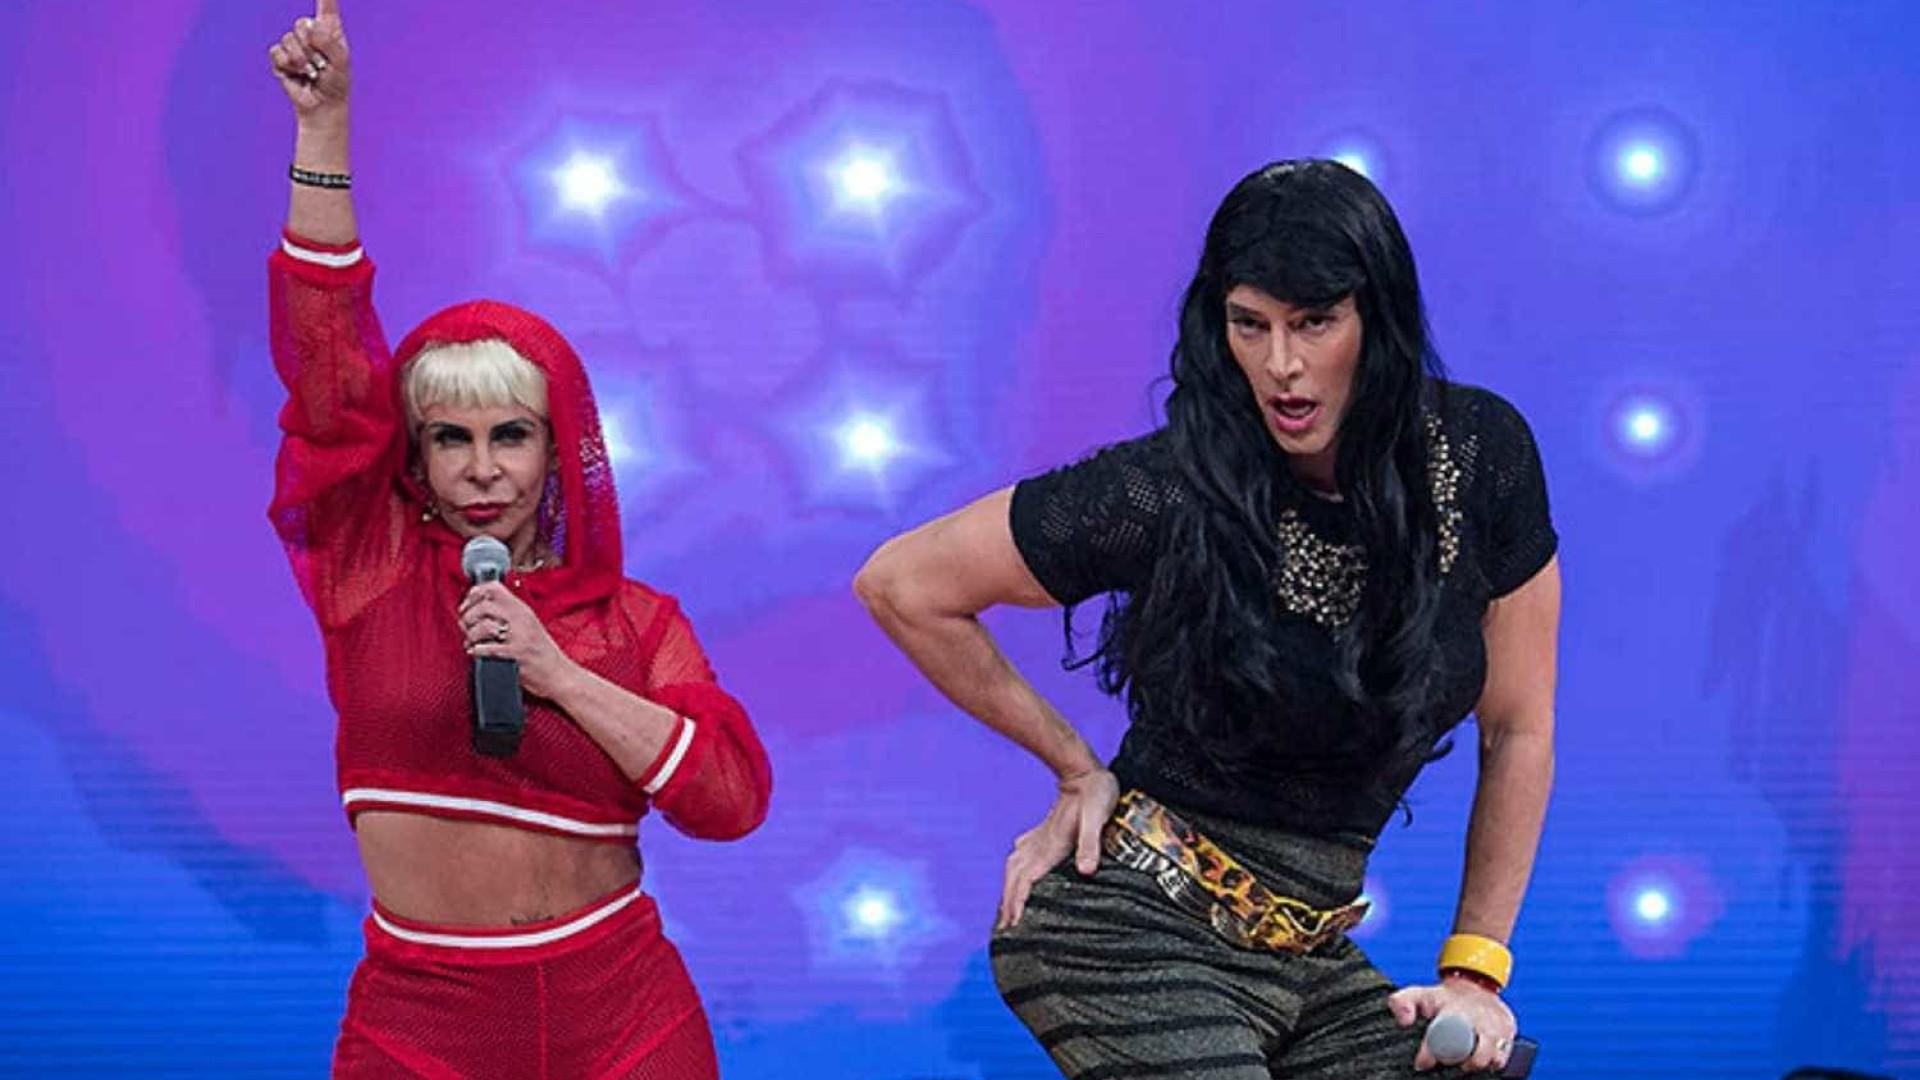 Faro celebra Gretchen e promete encontro entre ela e Katy Perry na TV